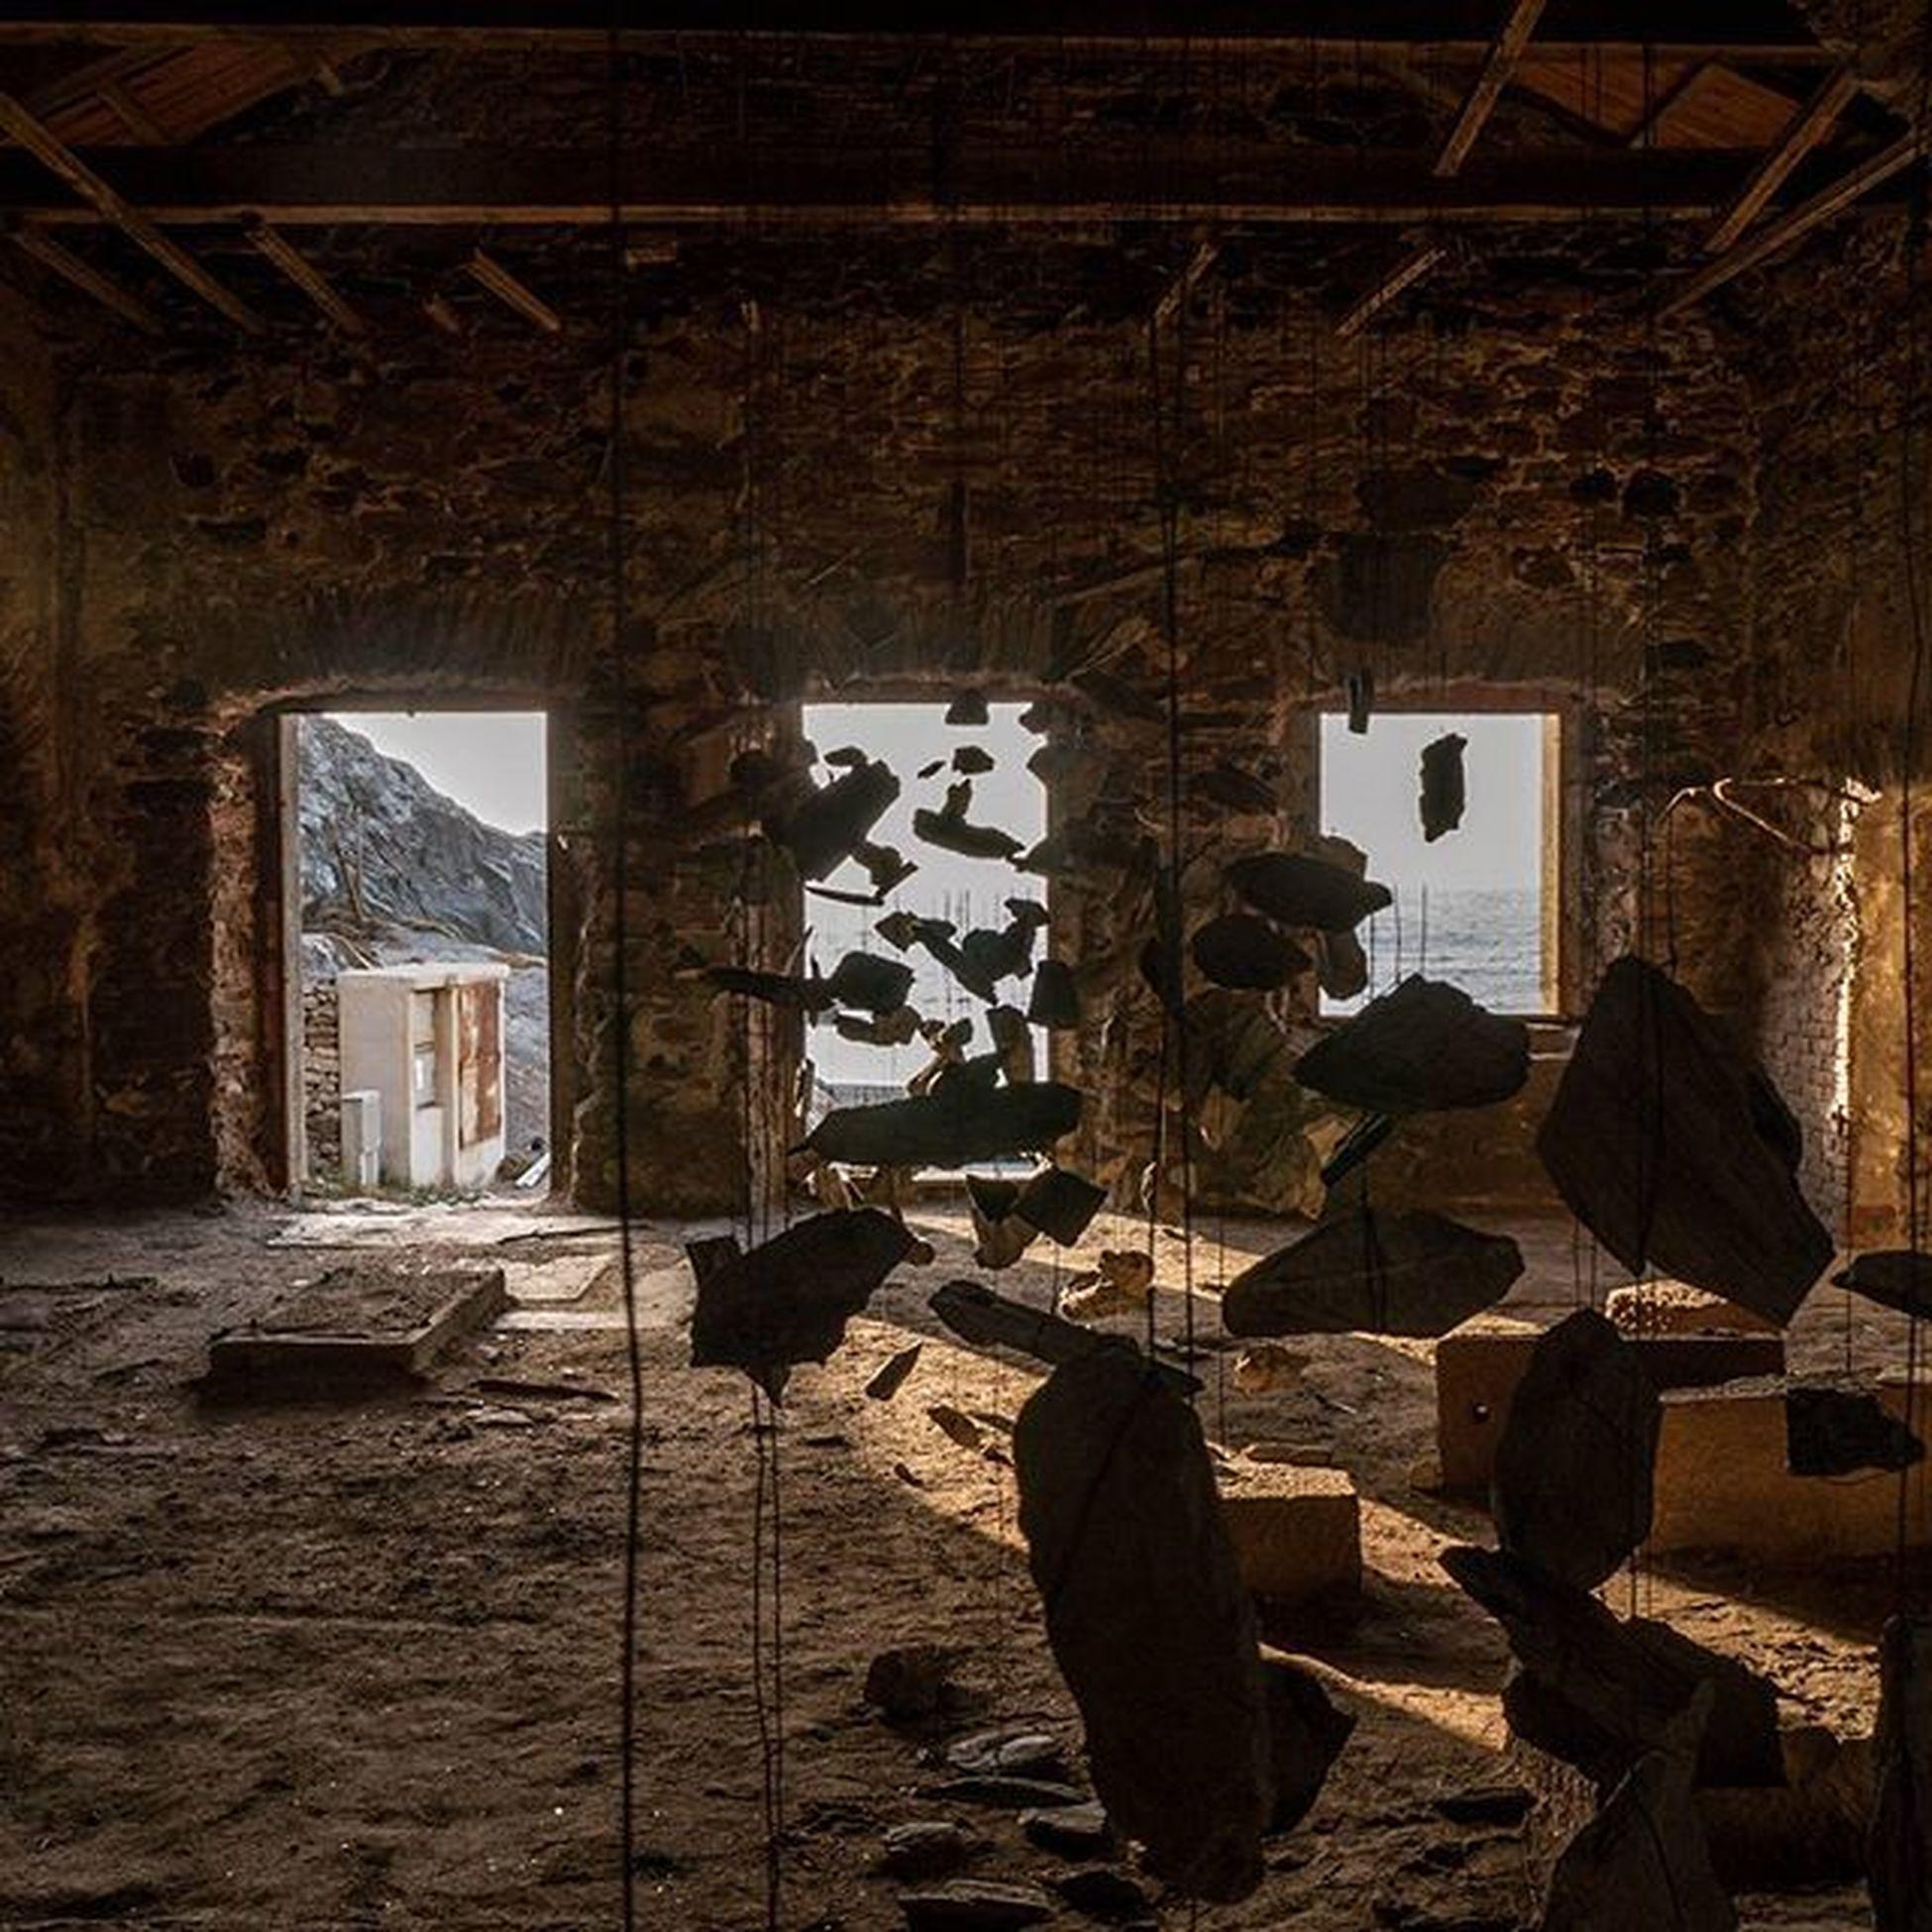 Installation at the Argentiera Sardinia Sardiniaholiday